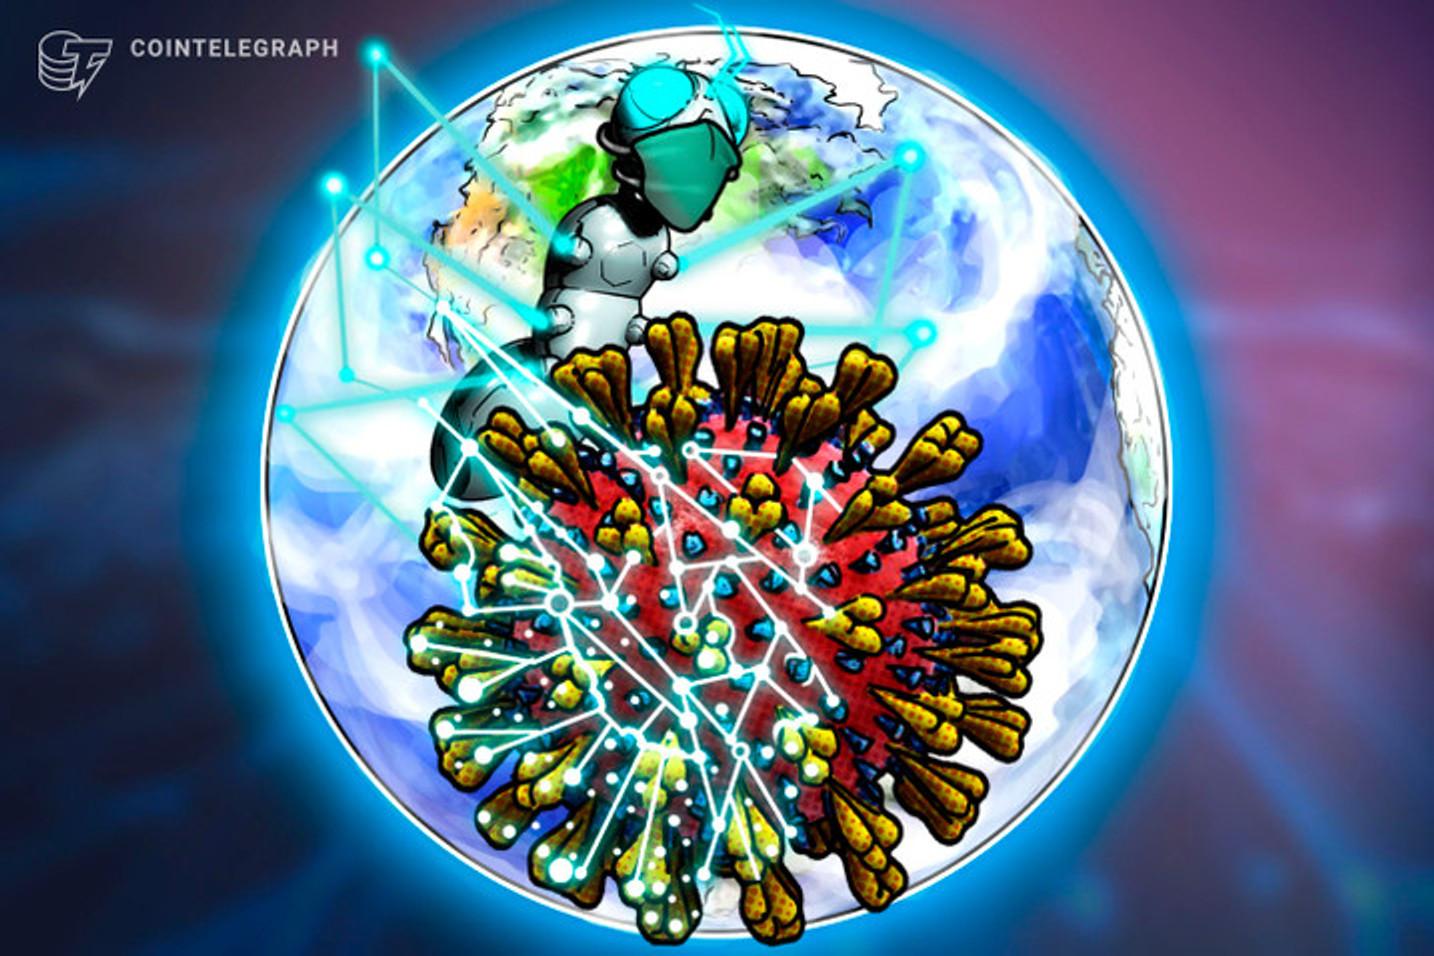 España: Plataforma blockchain MiPasa aporta datos a investigaciones sobre Covid-19